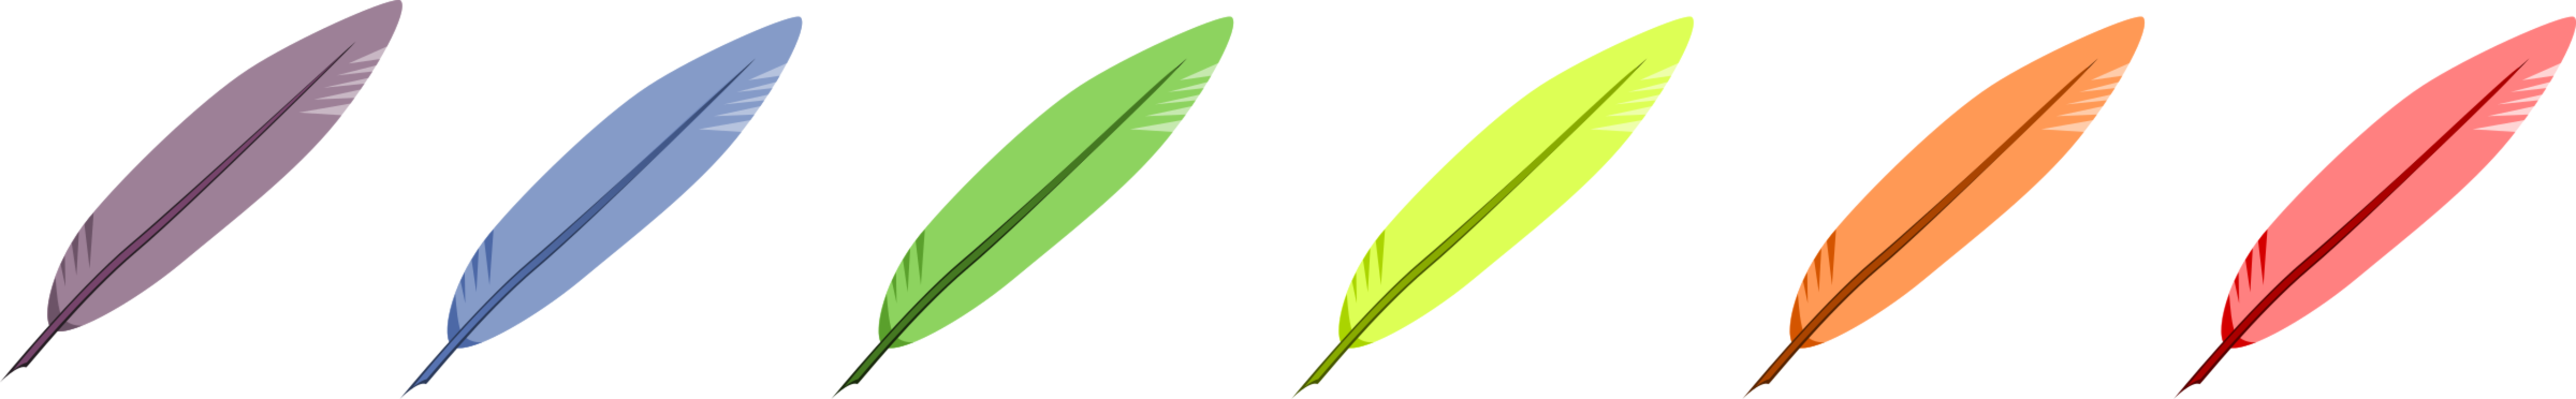 Angle,Wing,Leaf